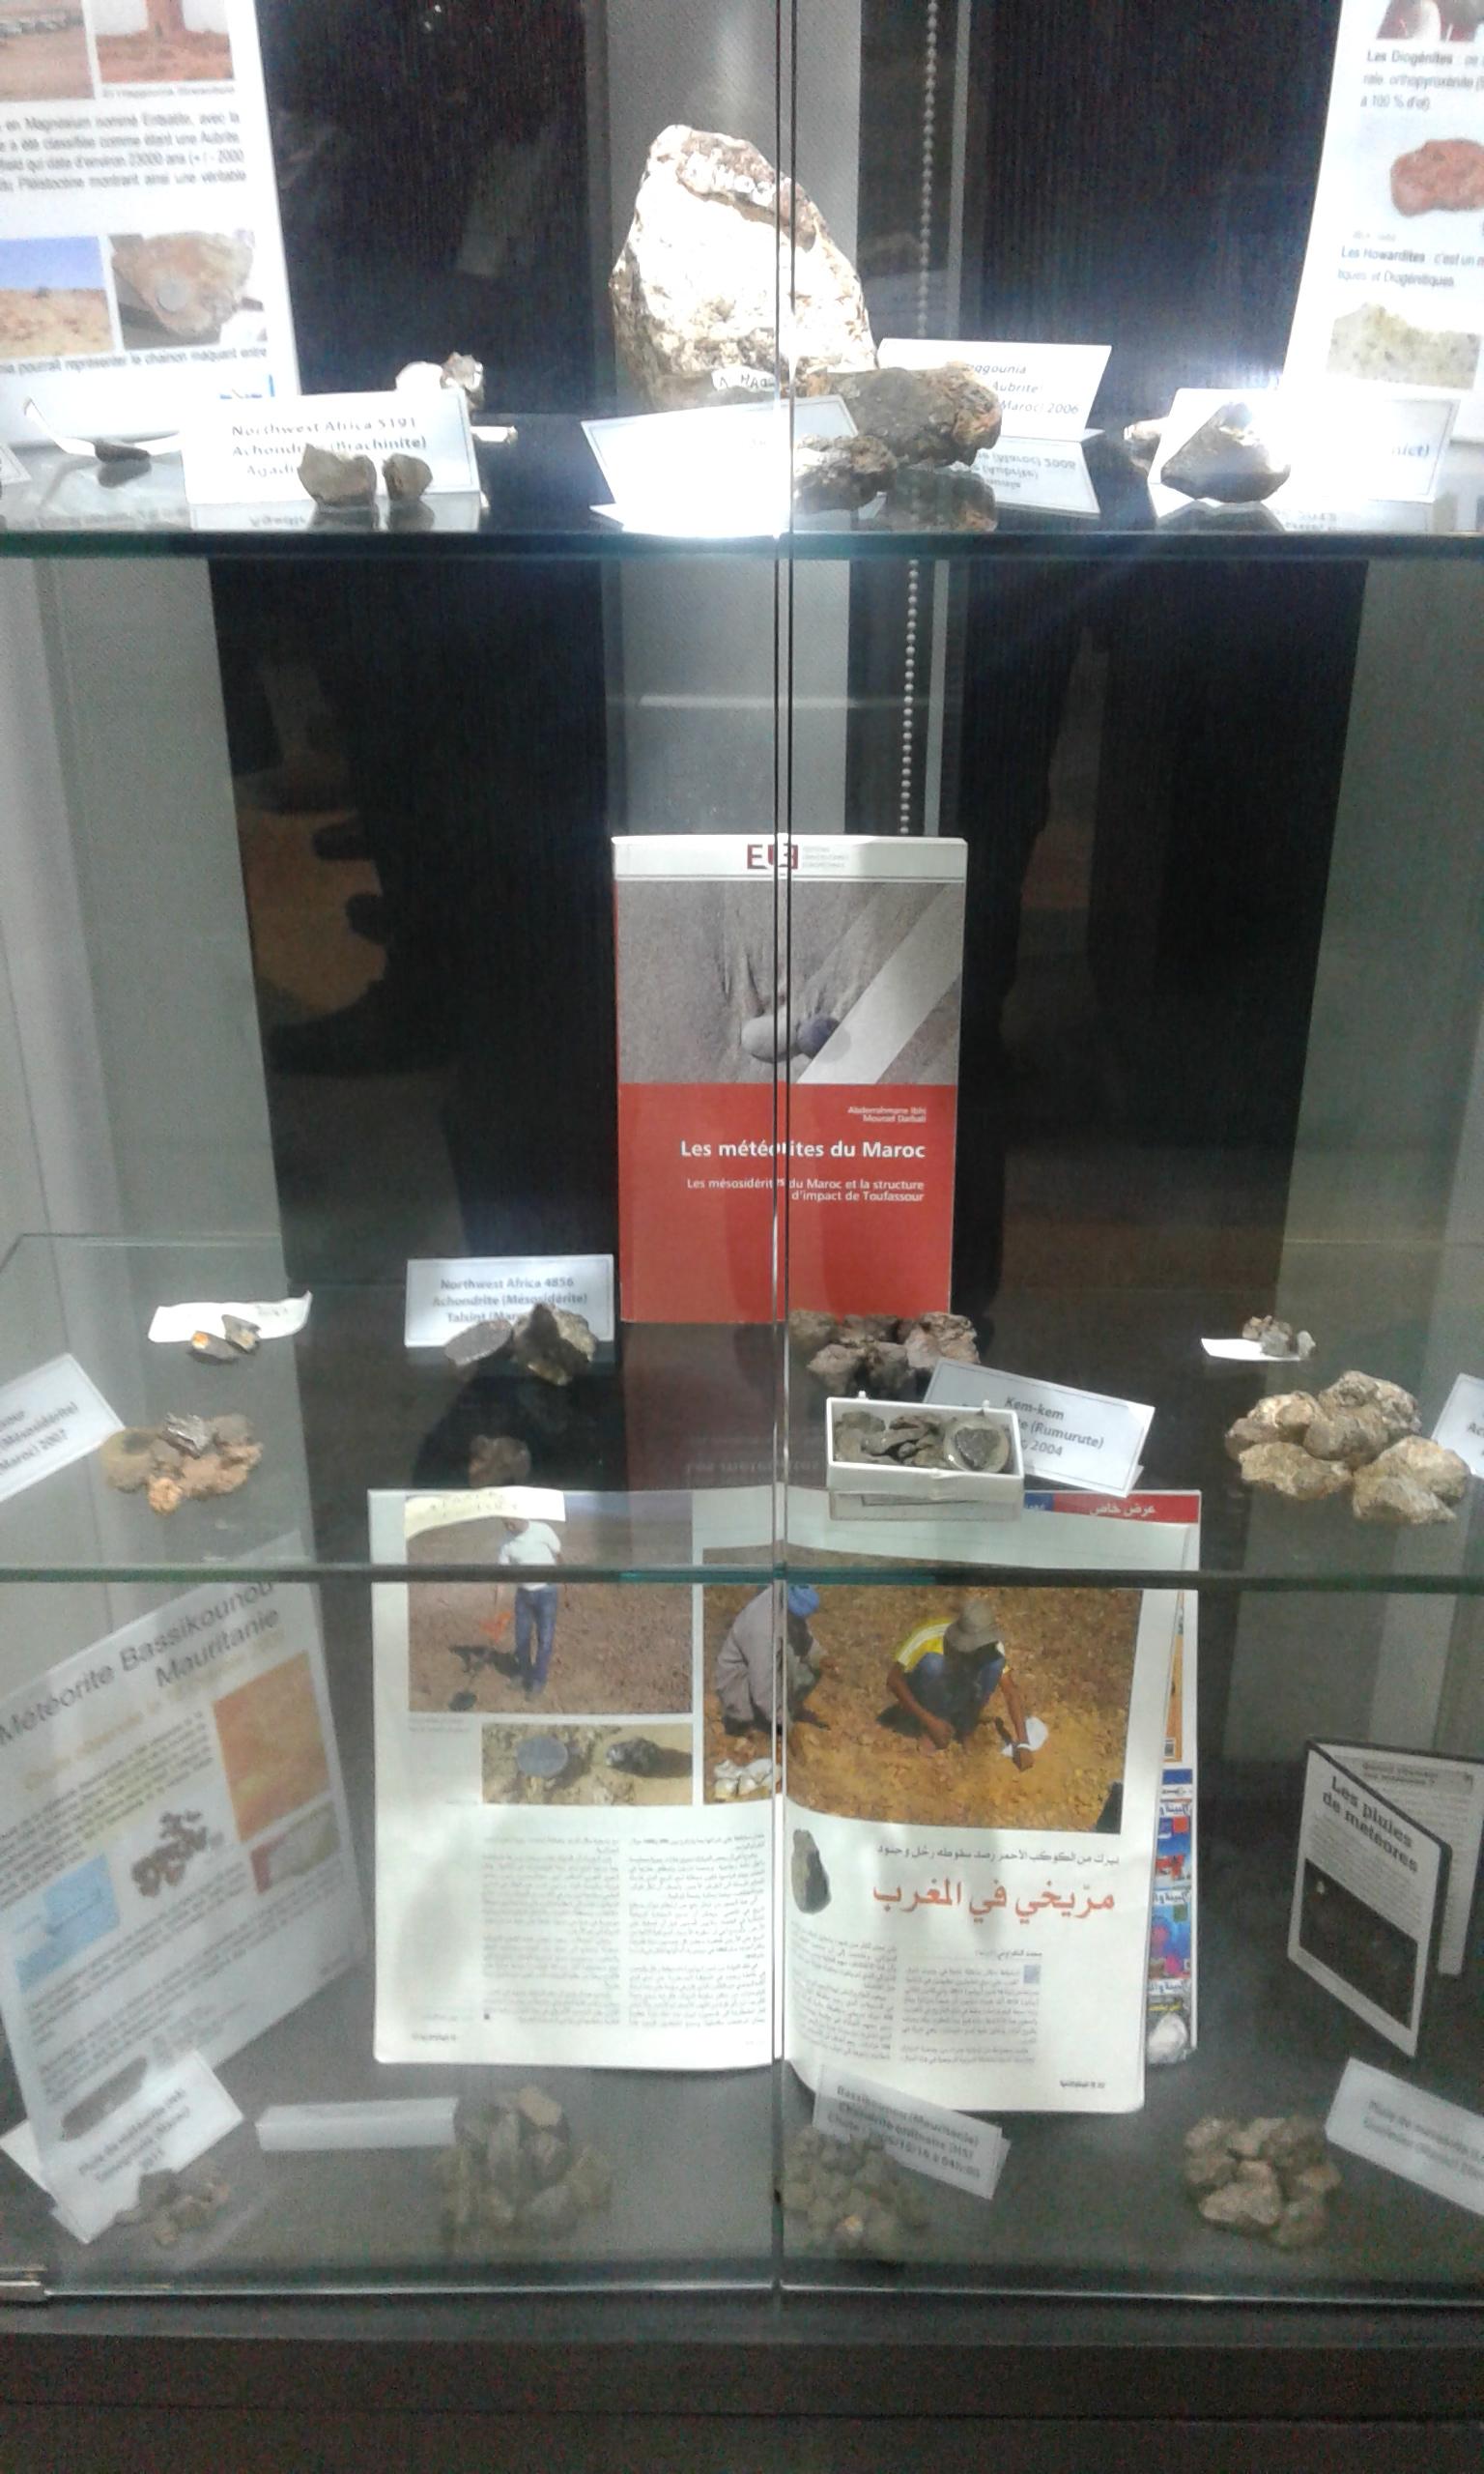 Metéorites agadir